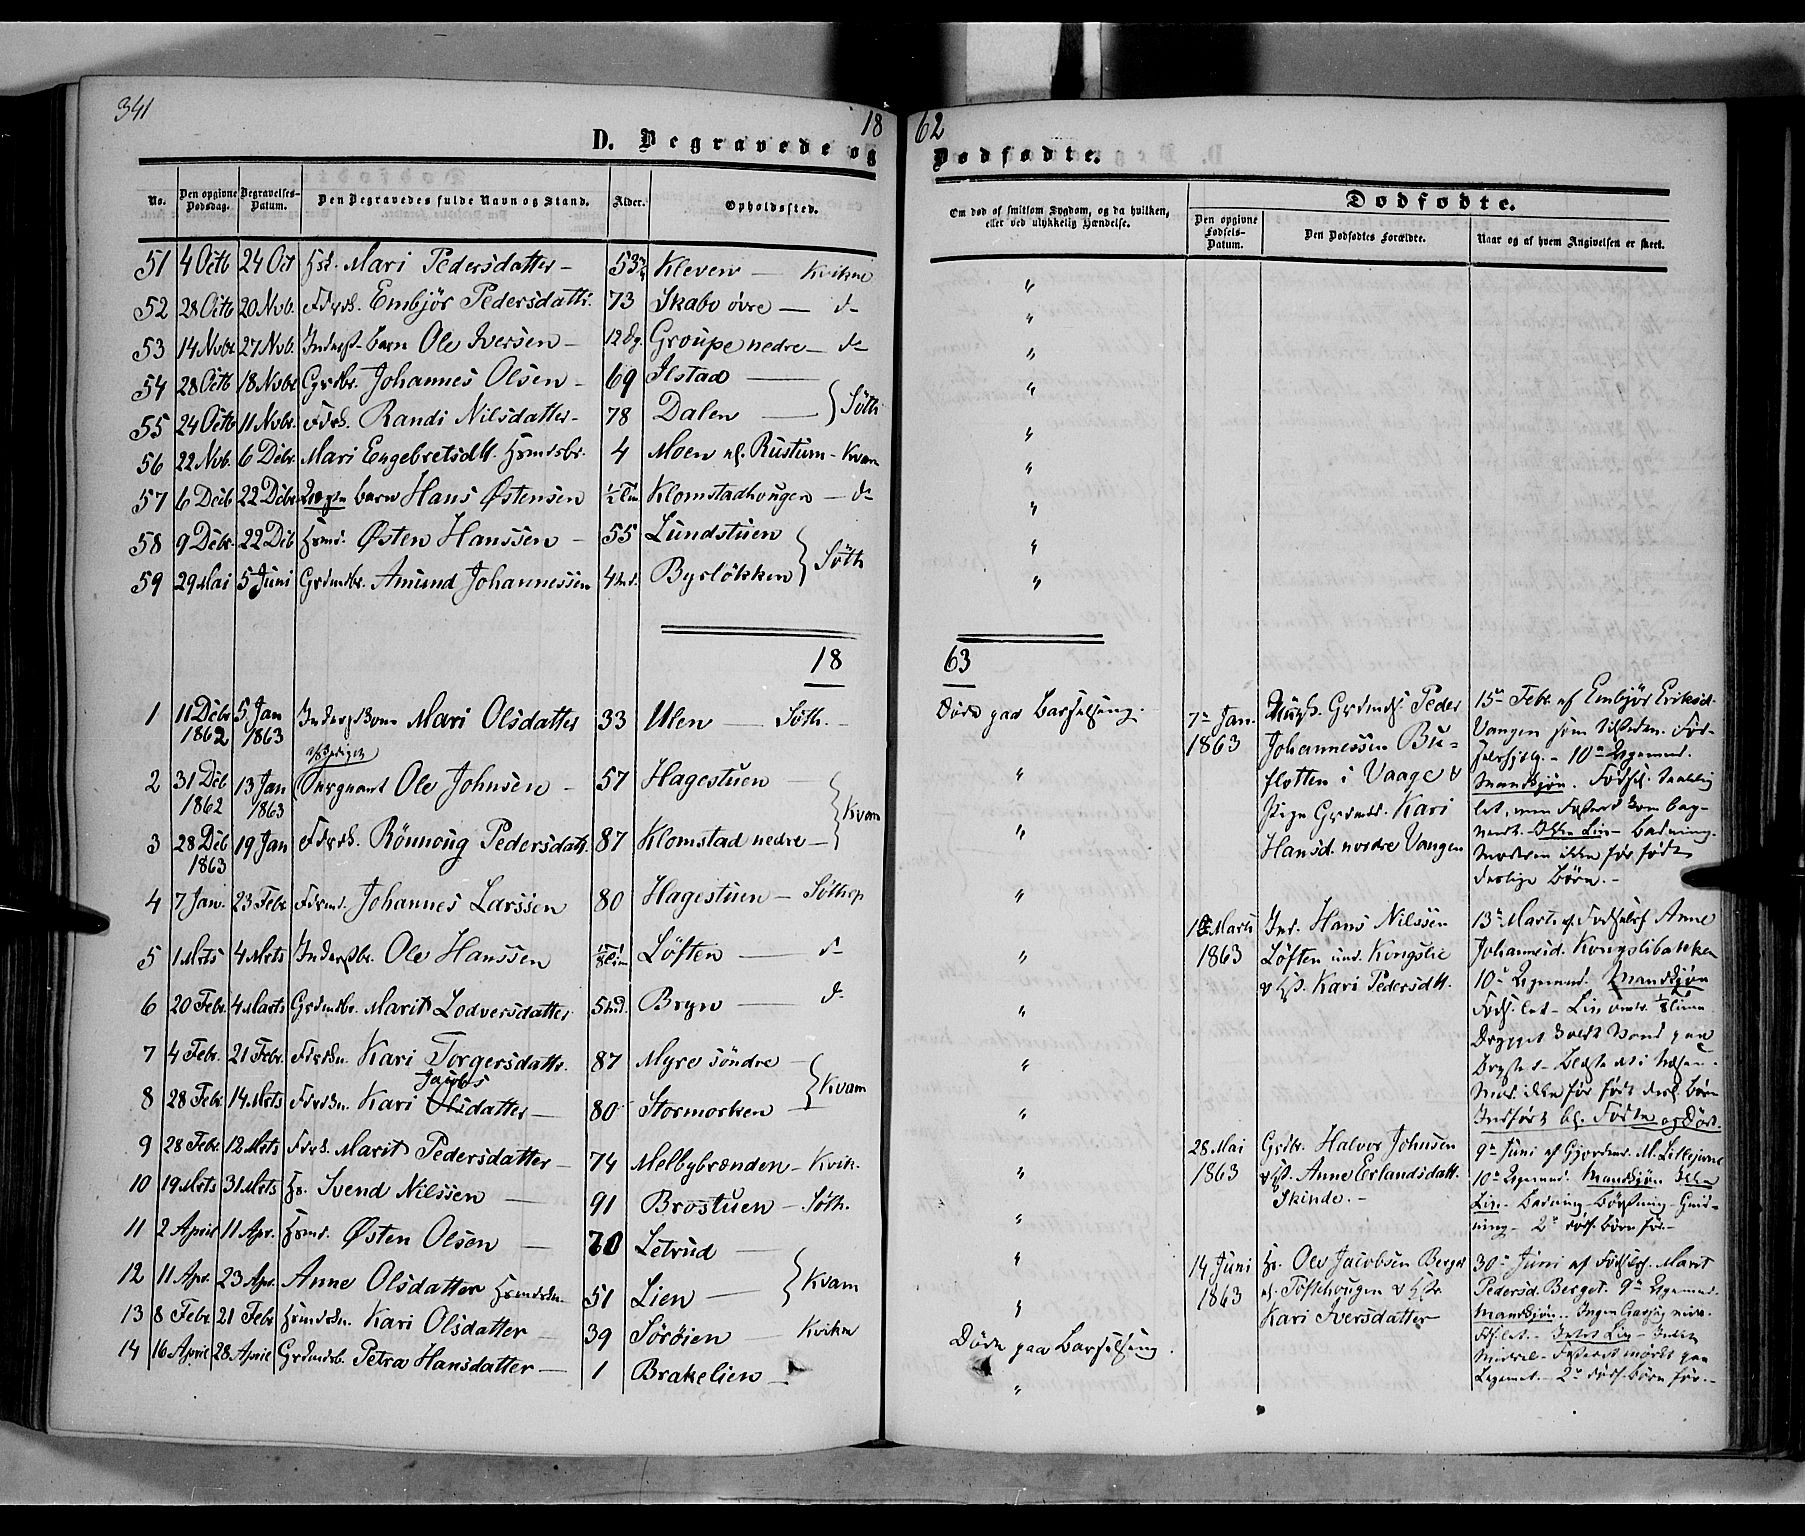 SAH, Nord-Fron prestekontor, Ministerialbok nr. 1, 1851-1864, s. 341